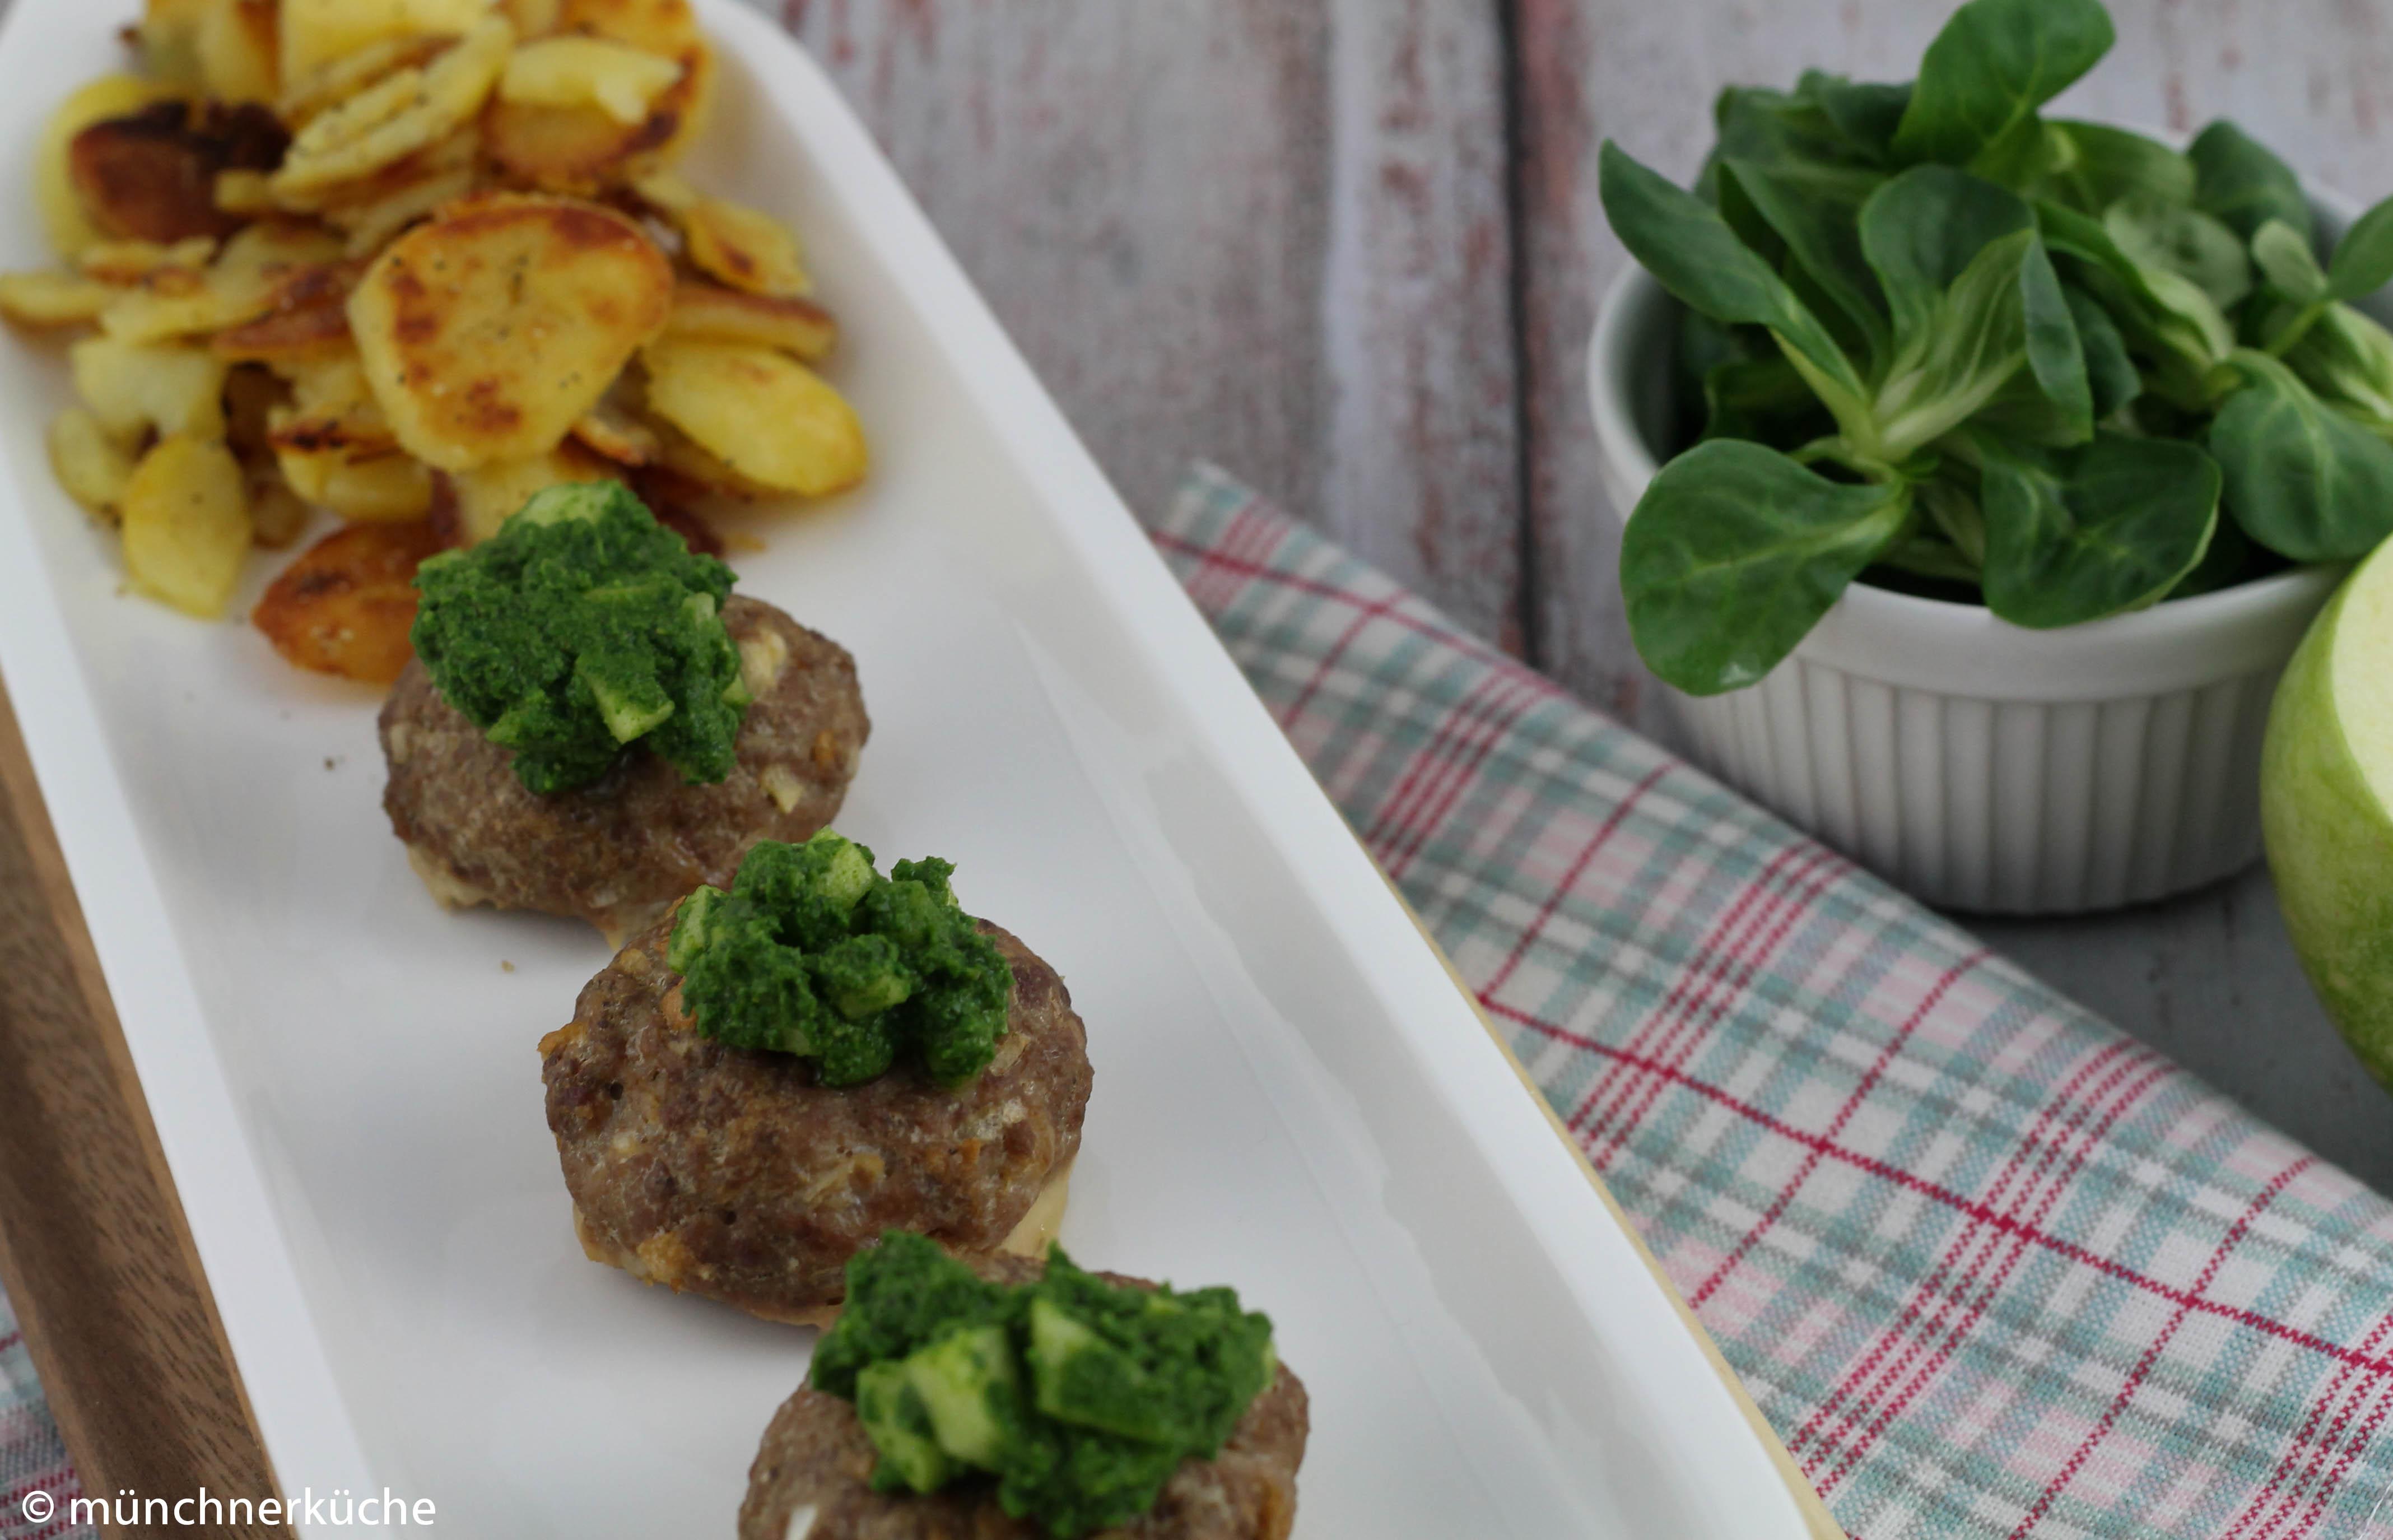 Ofen-Frikadellen mit Bratkartoffeln und Feldsalat-Apfel-Pesto